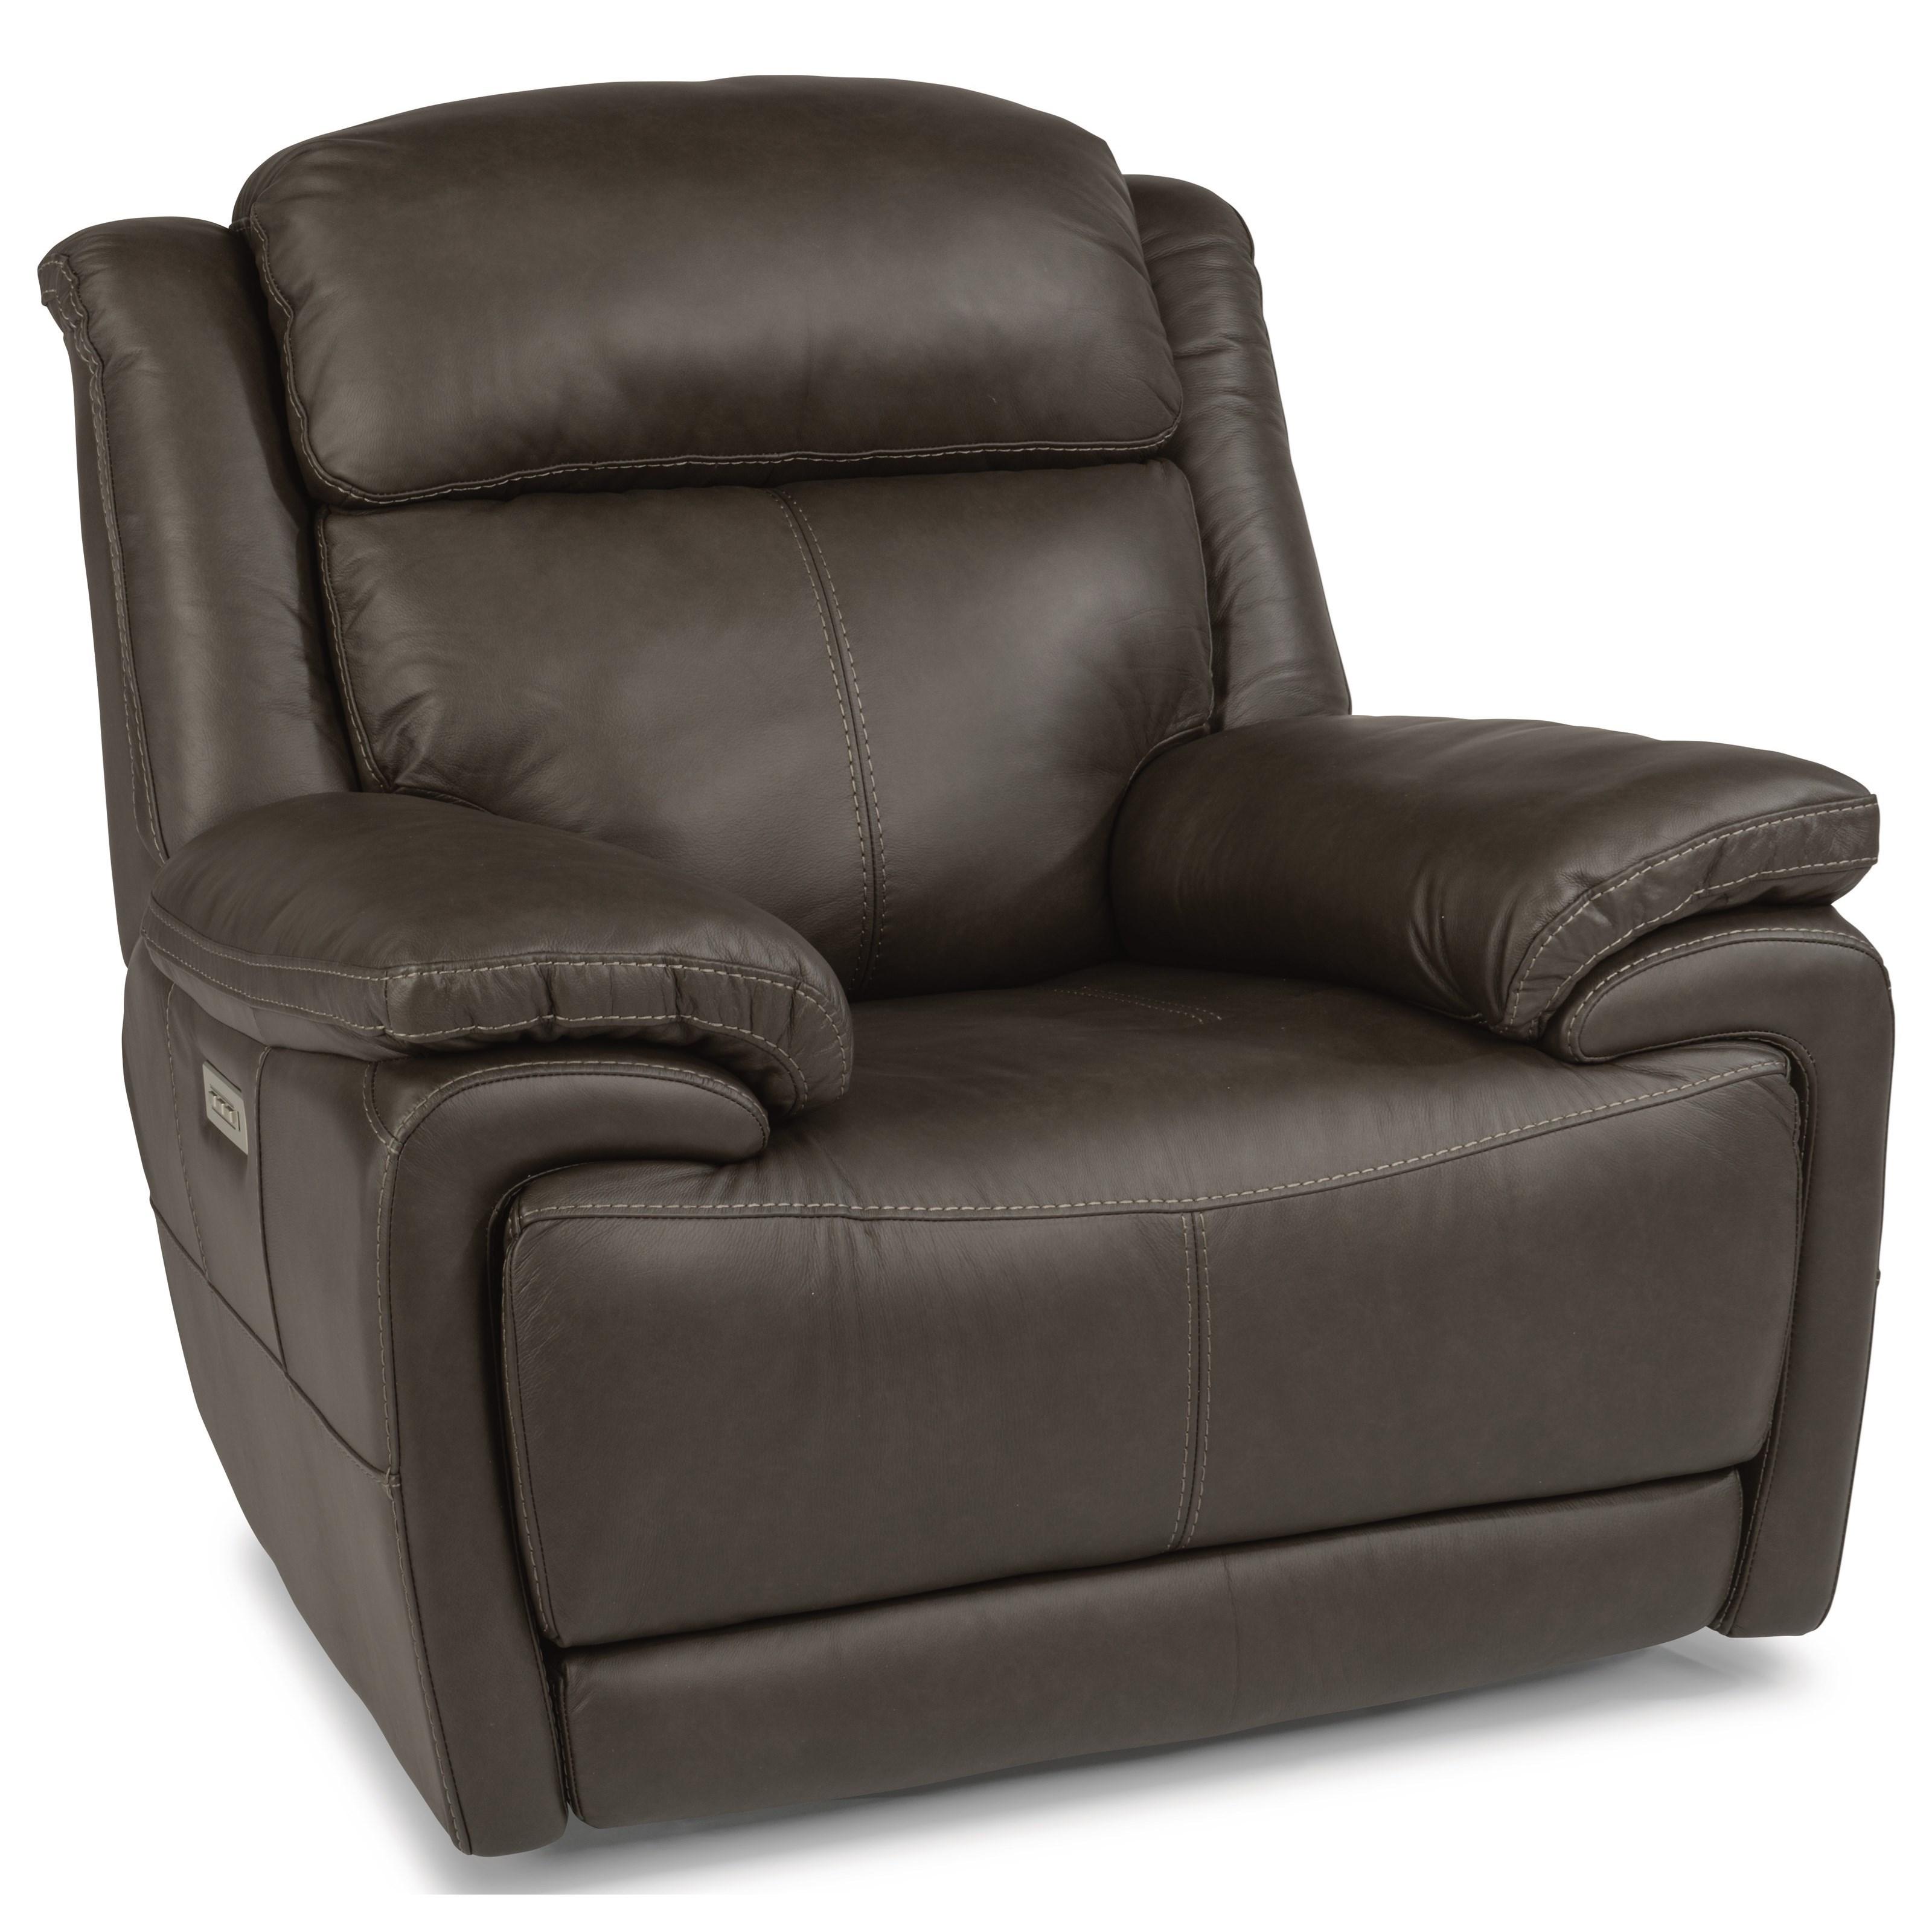 Latitudes - Elijah Power Recliner with Power Headrest by Flexsteel at Walker's Furniture